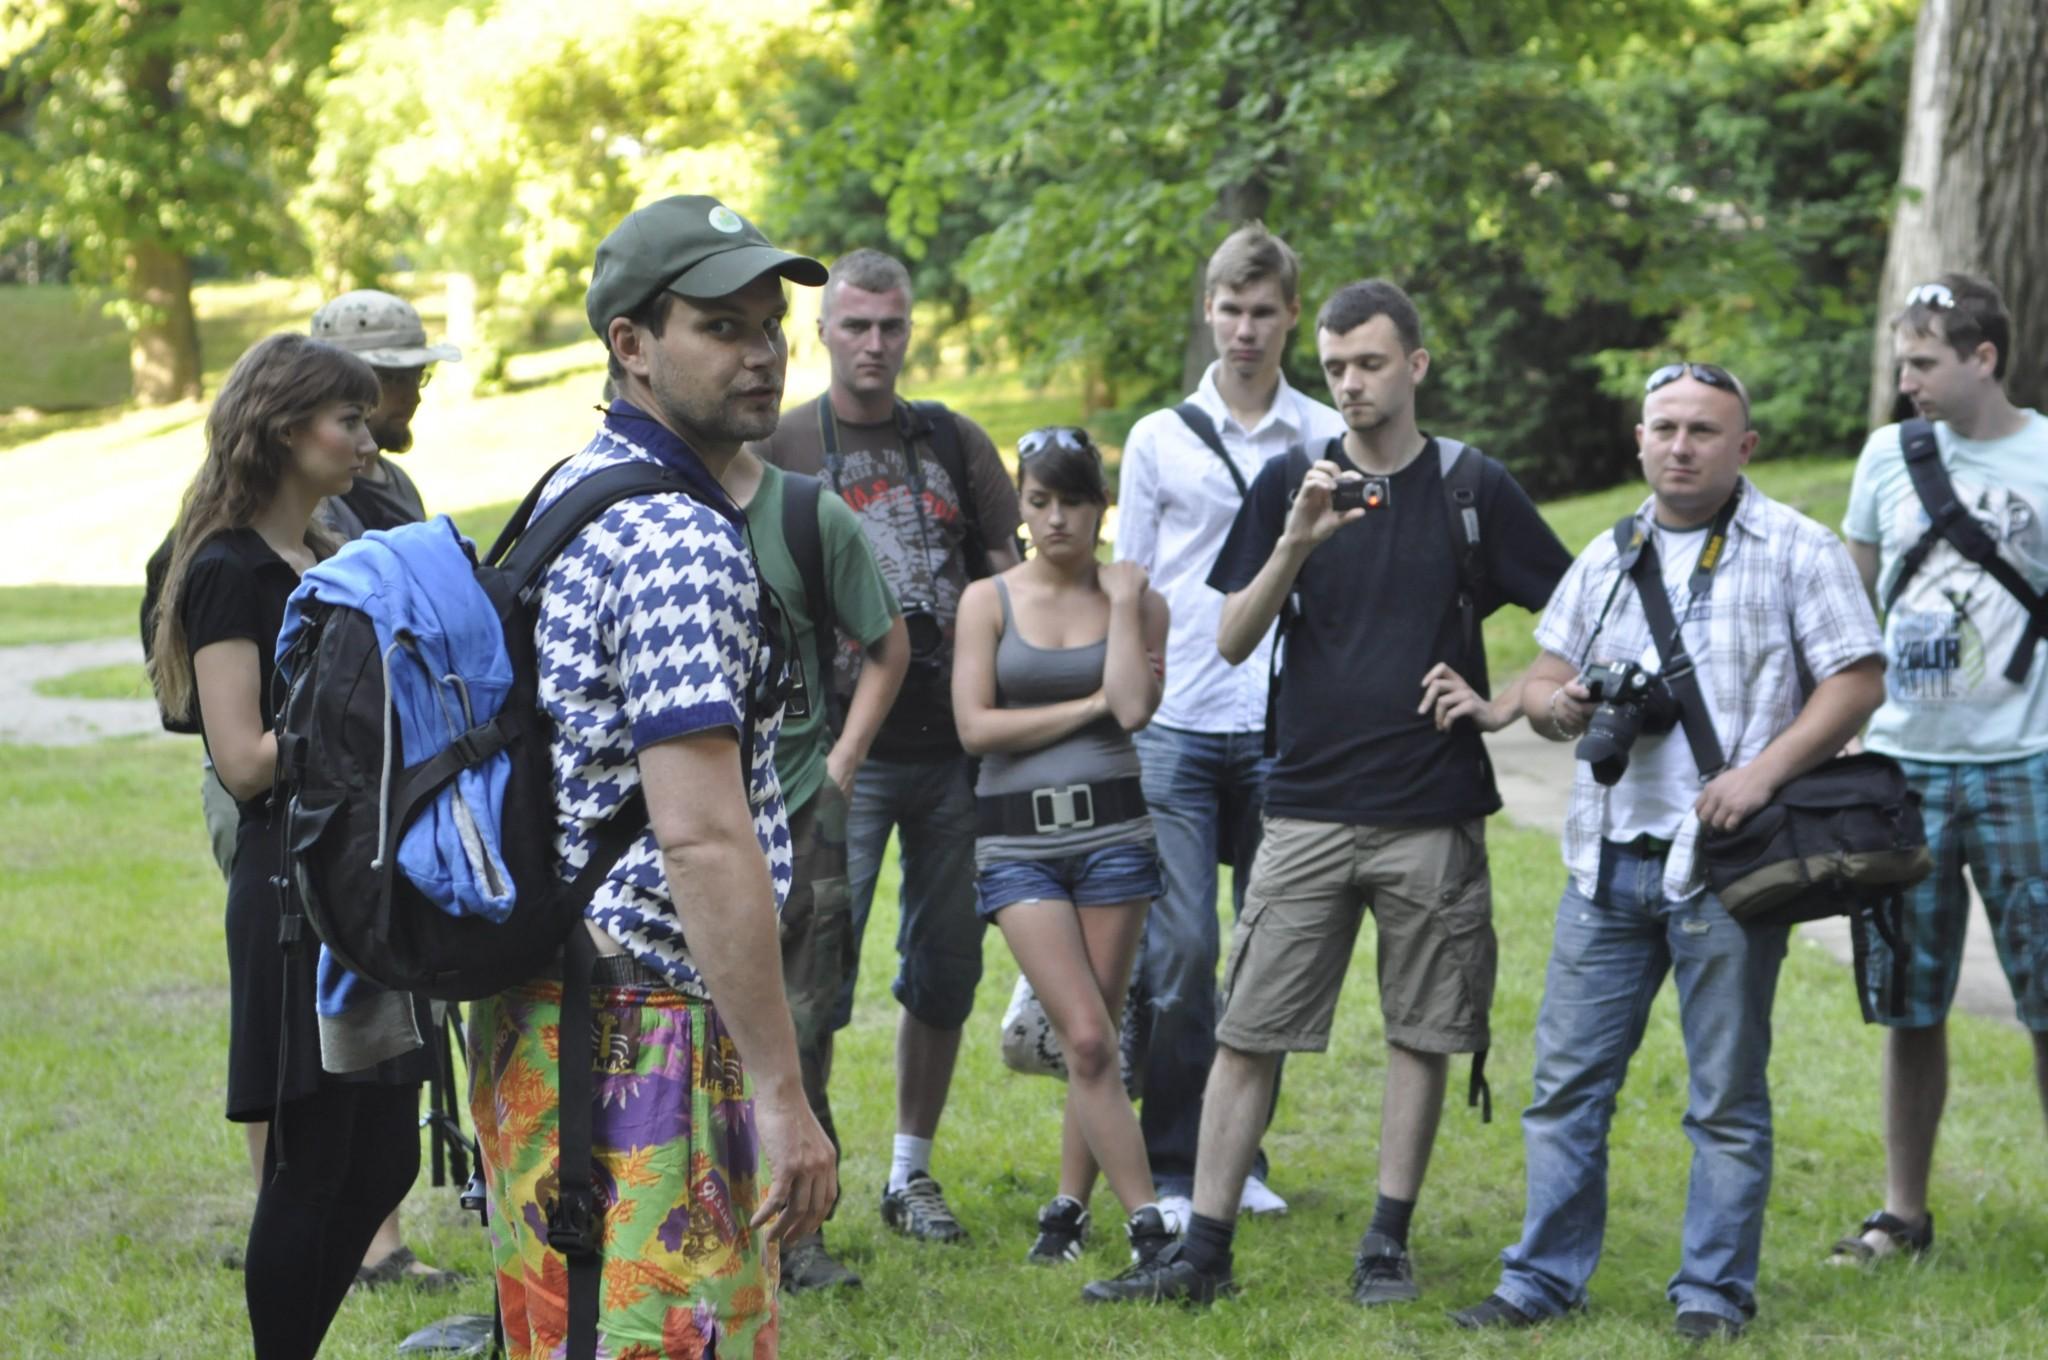 Fotomotif Festival 2010 plener z Igorem Omuleckim